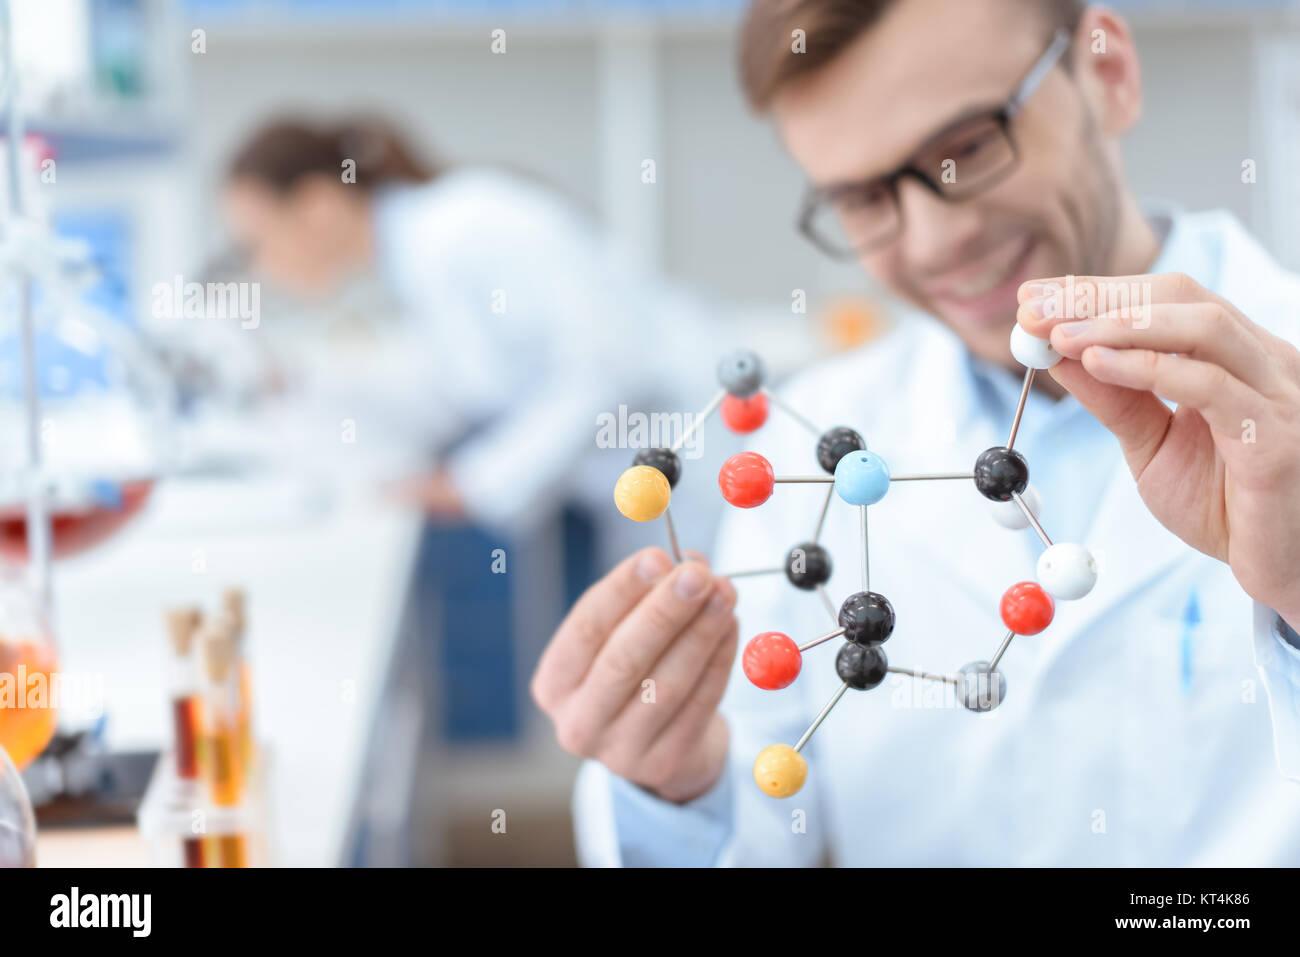 Smiling man scientifique à lunettes holding molecular model in lab Photo Stock